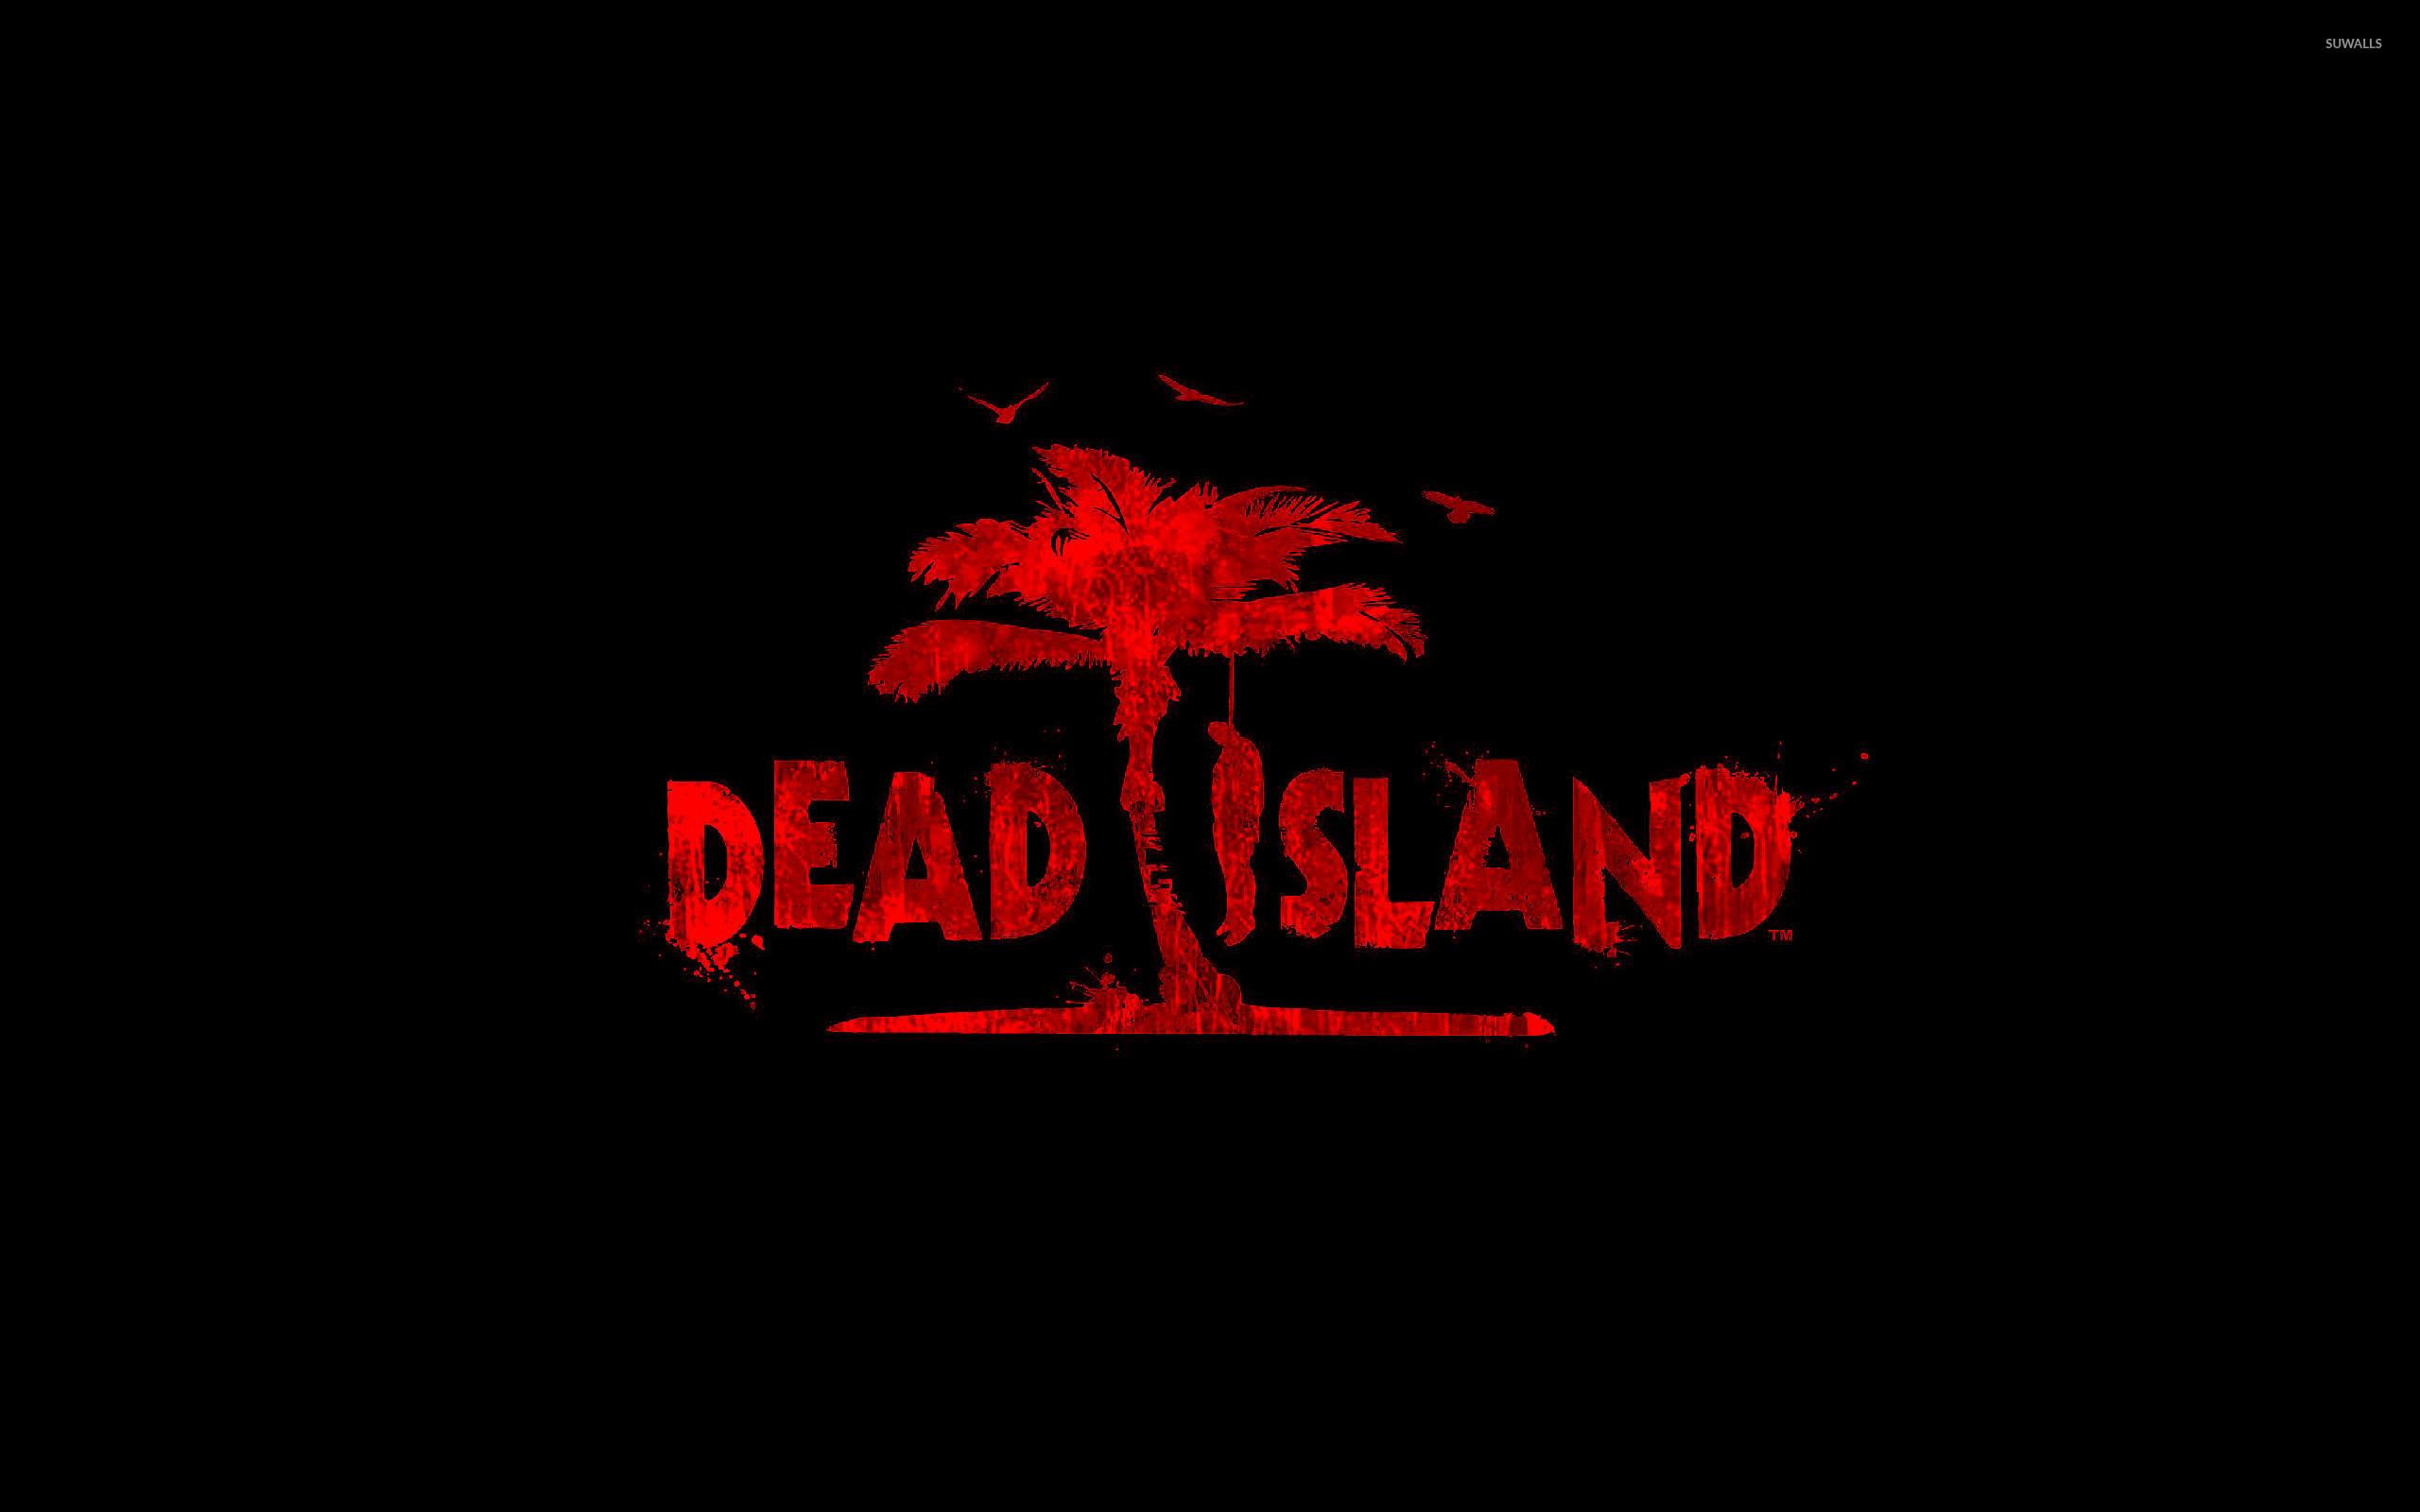 Dead Island wallpaper - Game wallpapers - #7872